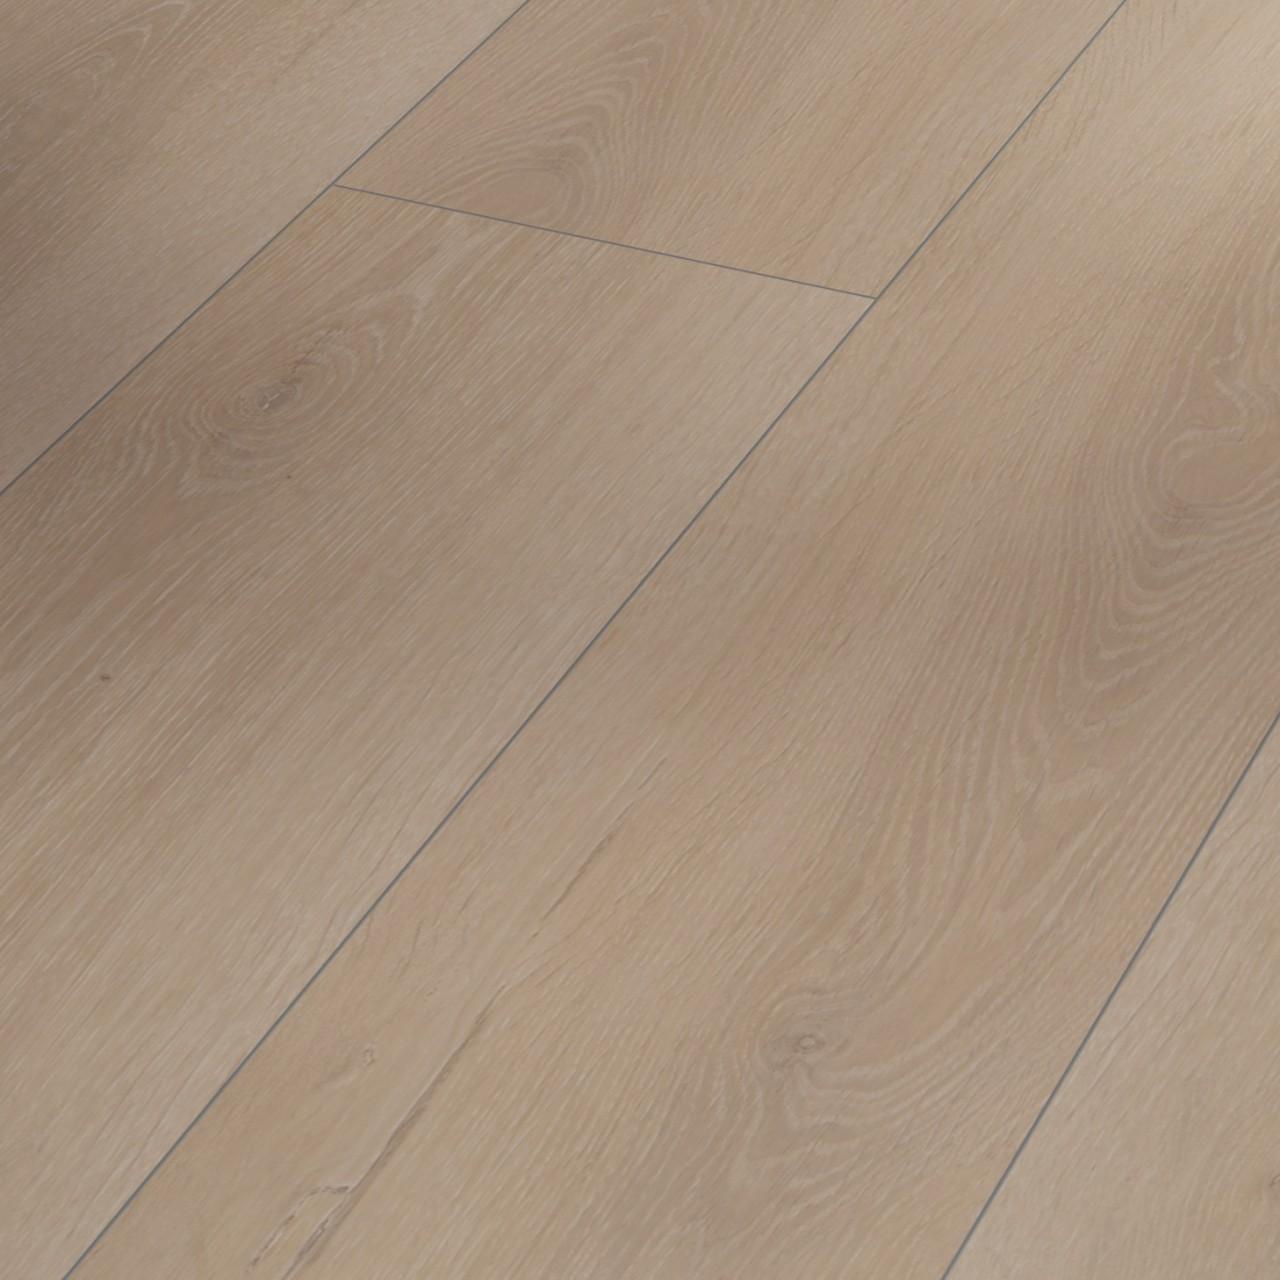 PARADOR Vinyl Eiche Skyline perlgrau Holzstruktur | Trendtime 6.30 | 14 m²